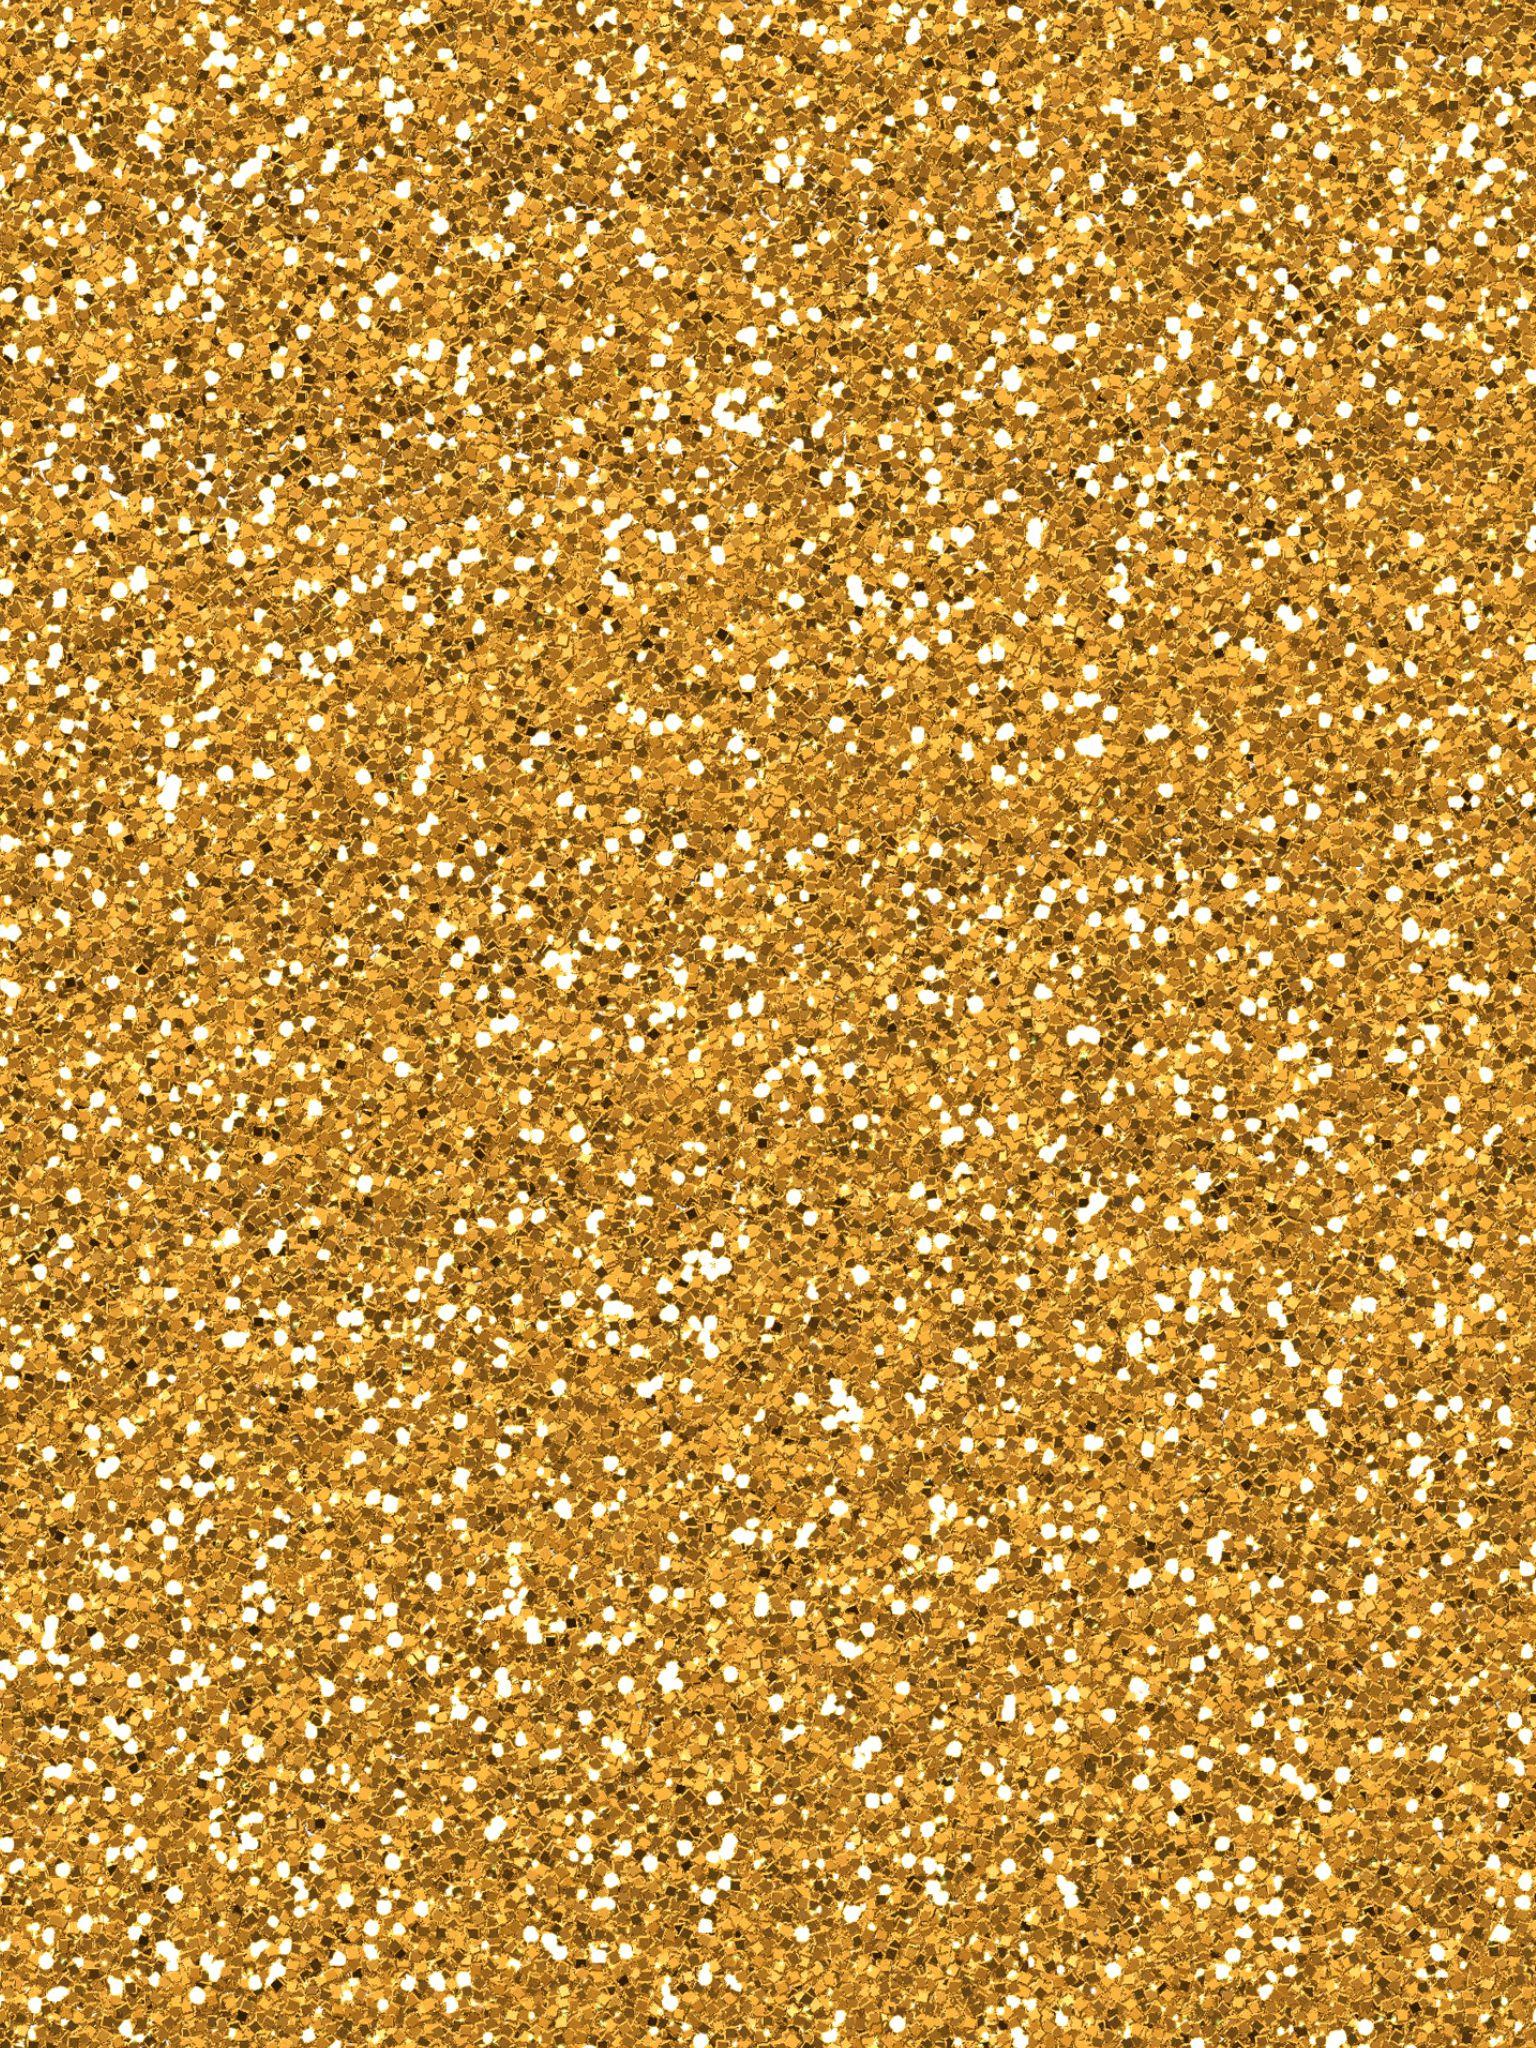 Gold sparkles iPhone walpaper | Iphone wallpaper glitter ...